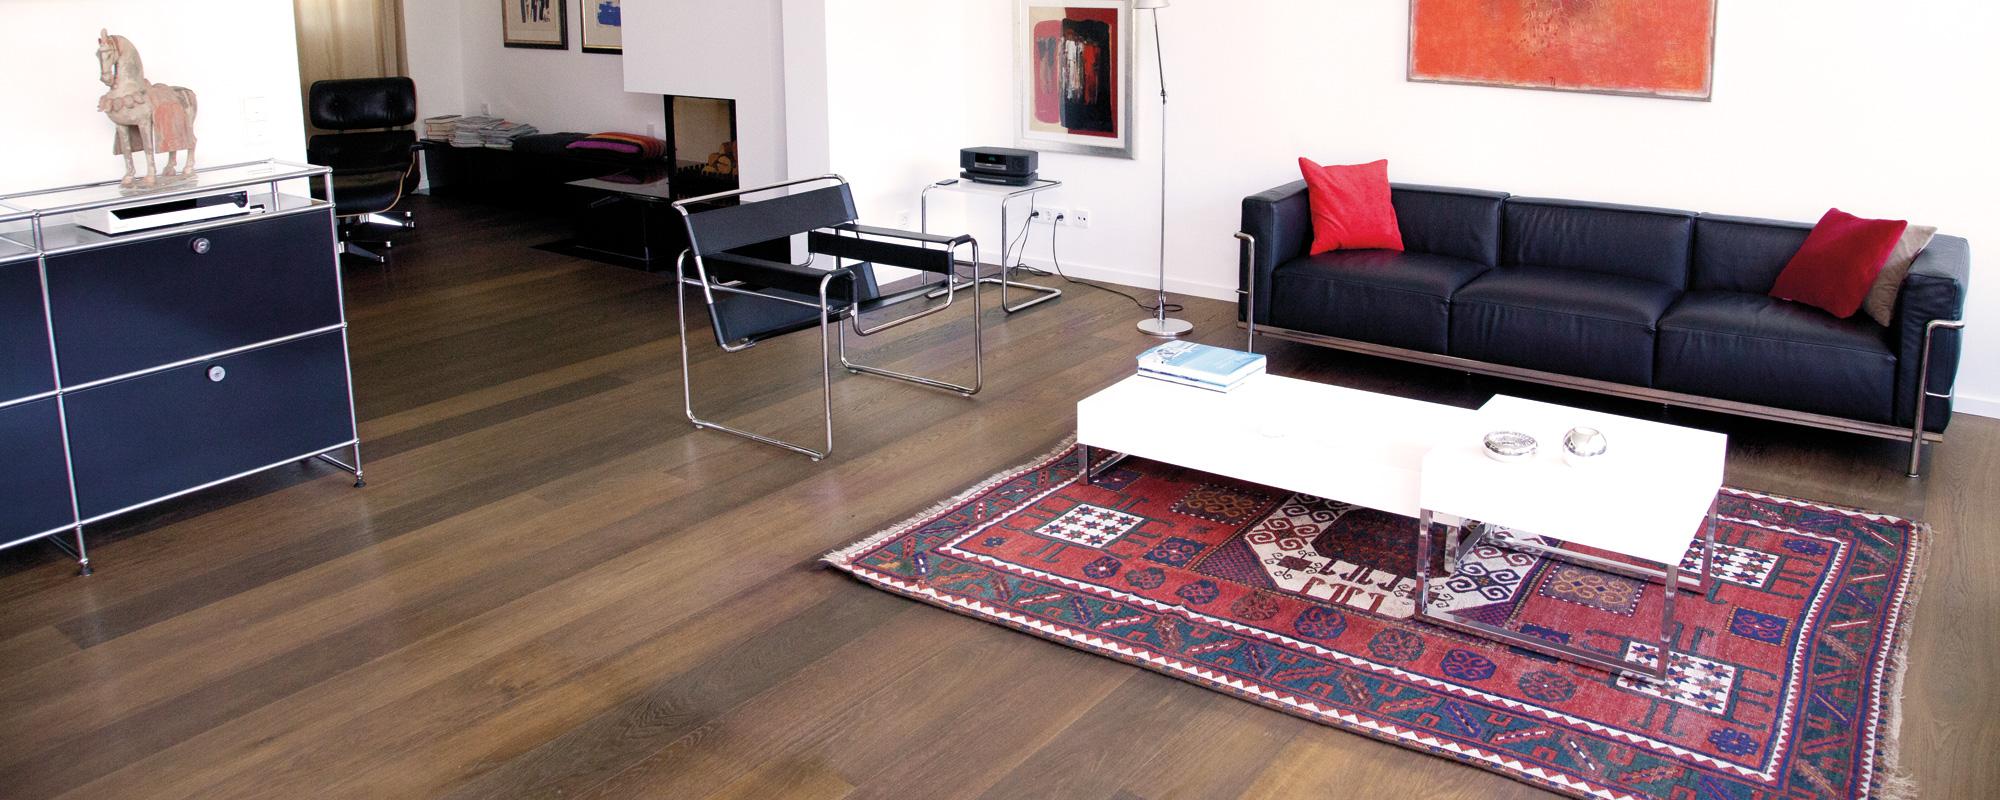 Lack Serie Design Eiche geräuchert Country Style Flooring Parkett Dielen Köln